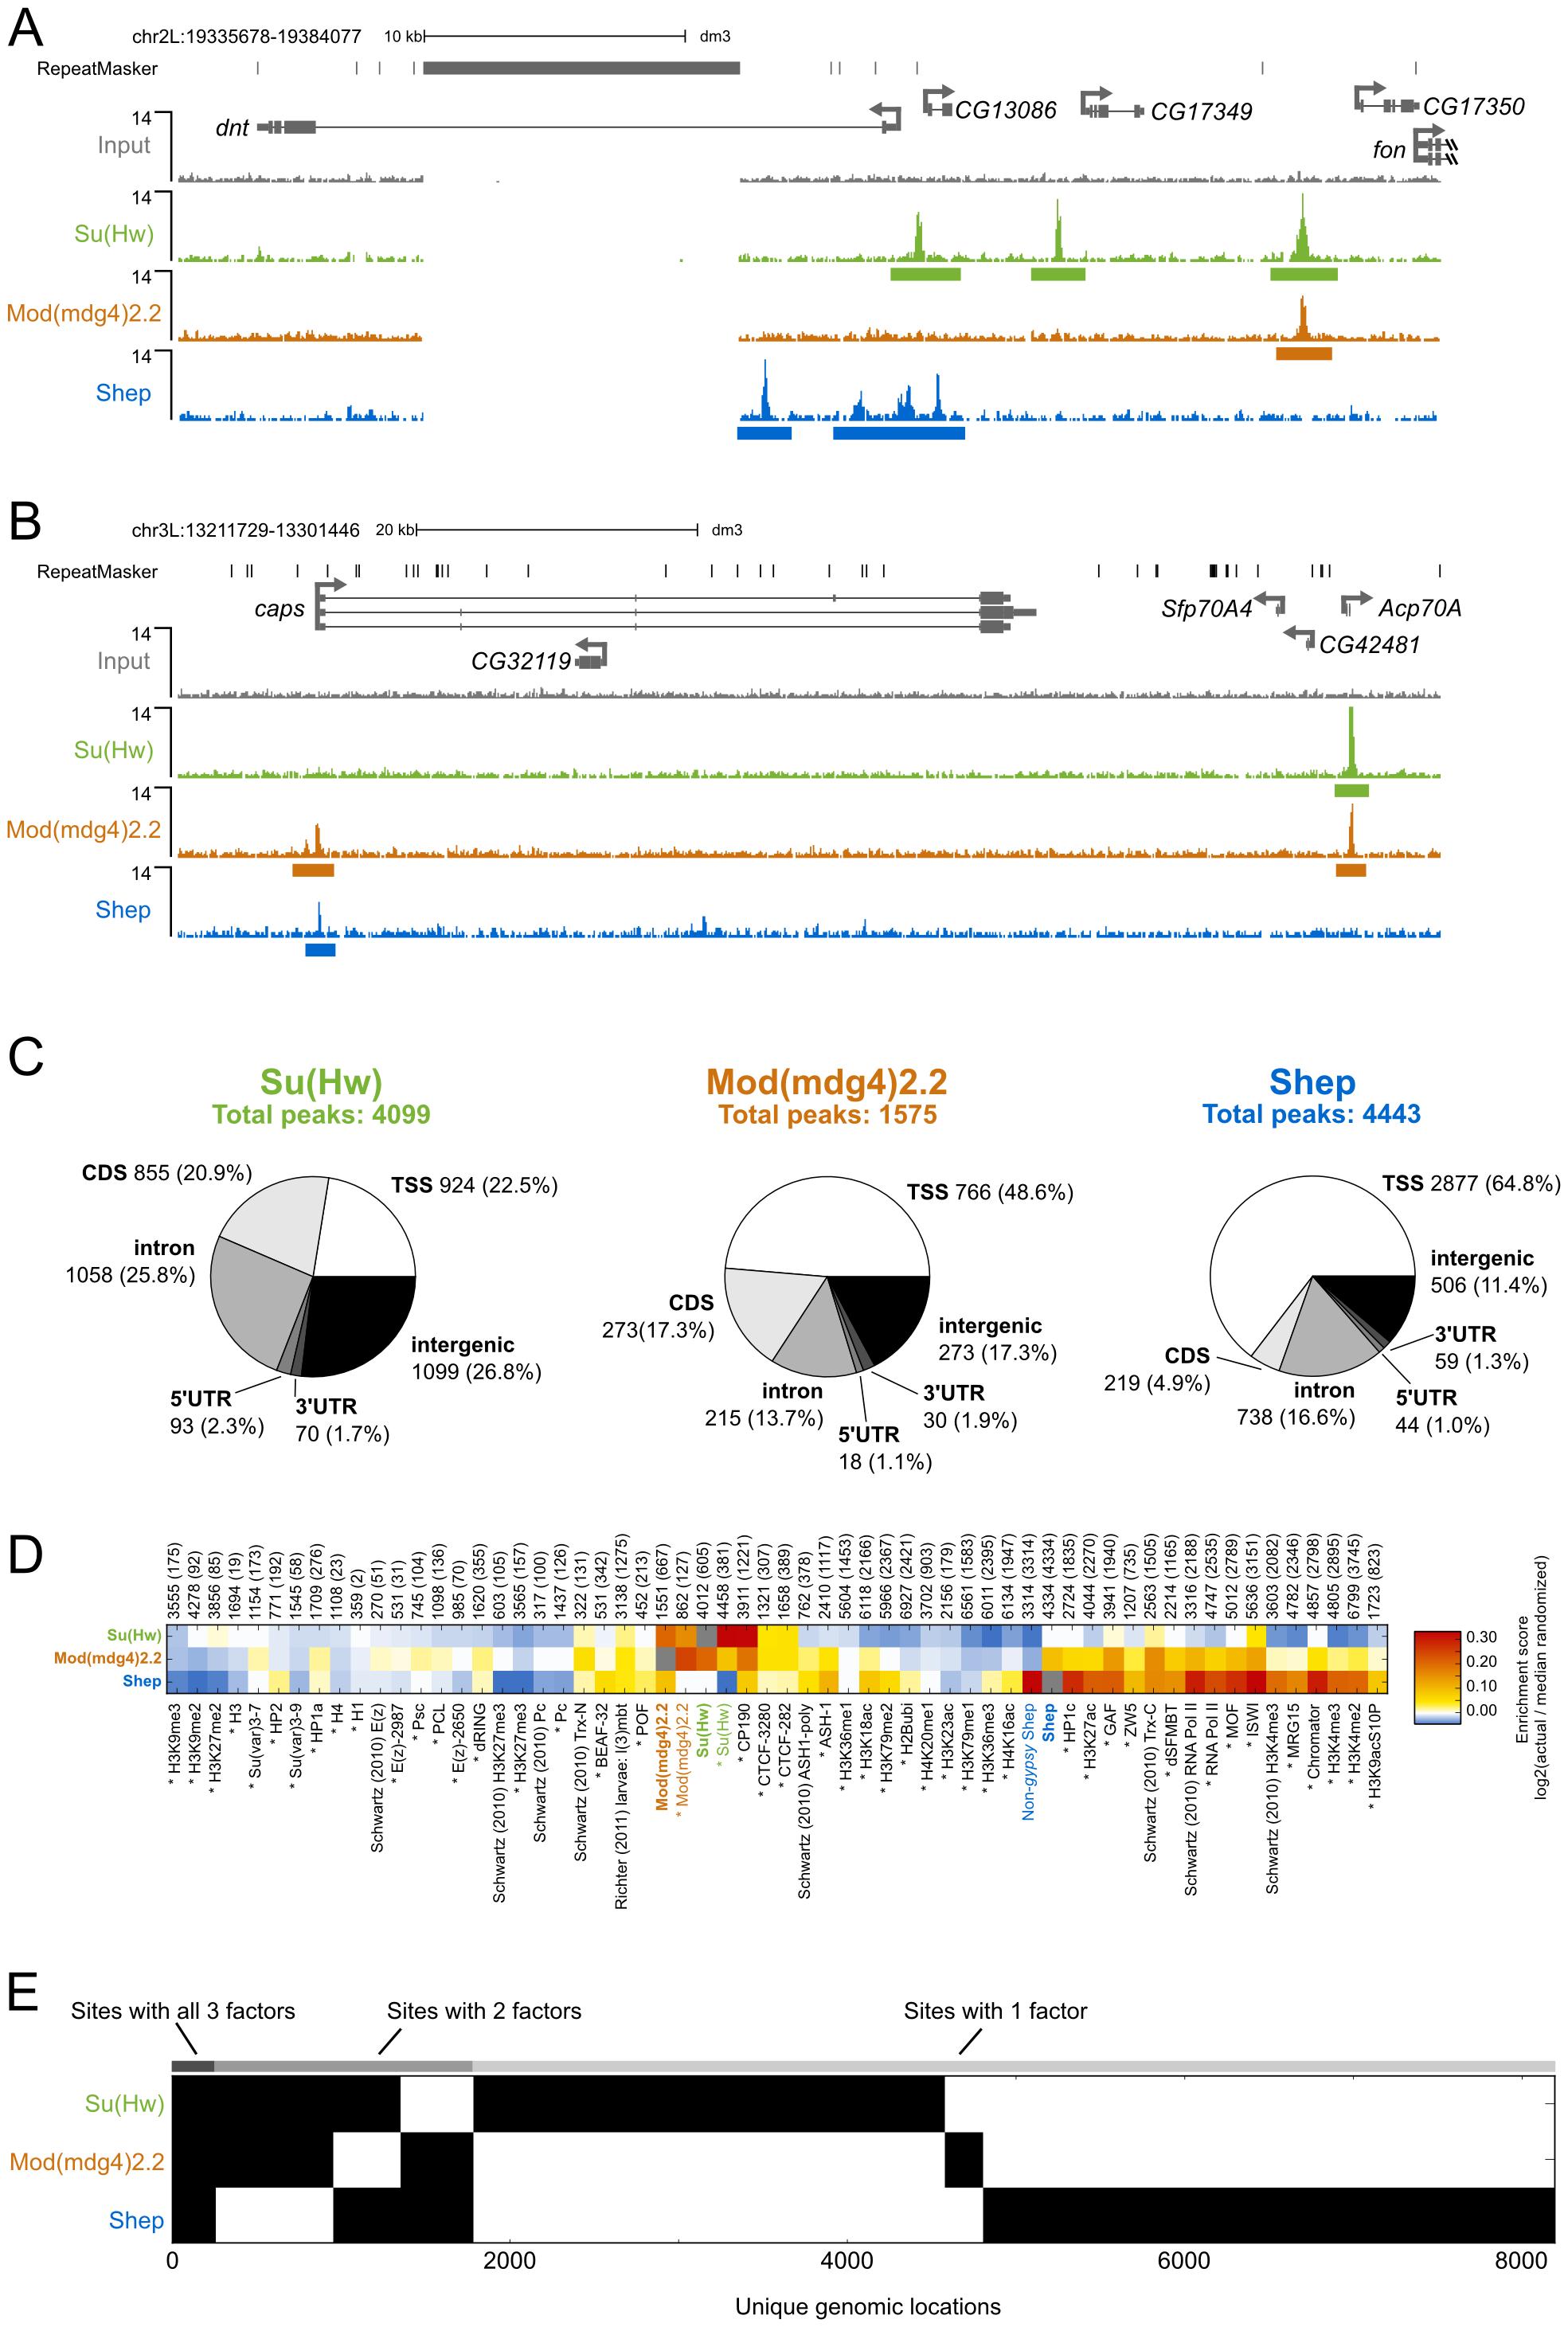 Comparison of Su(Hw), Mod(mdg4)2.2, and Shep ChIP–seq profiles in BG3 cells.